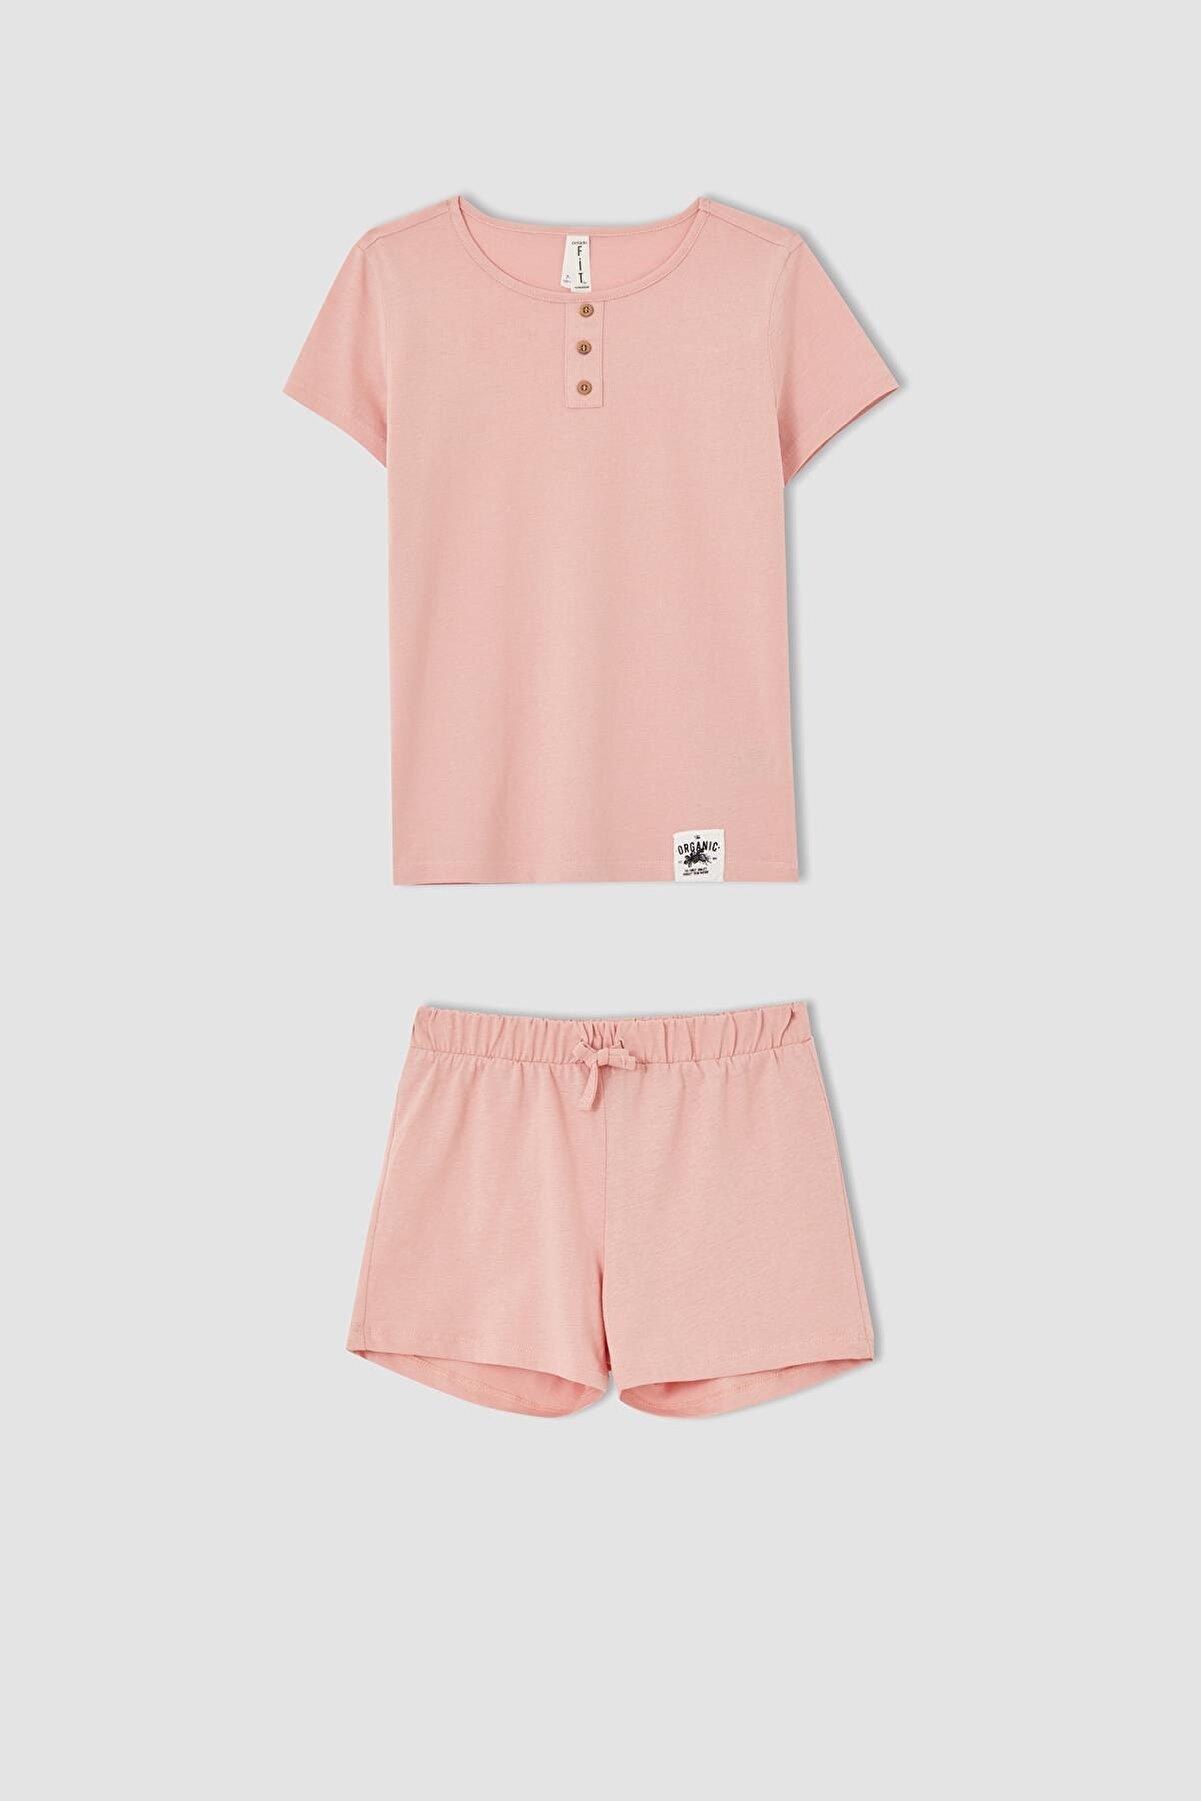 Defacto Kız Çocuk Organik Pamuk Kısa Kollu Pijama Takımı